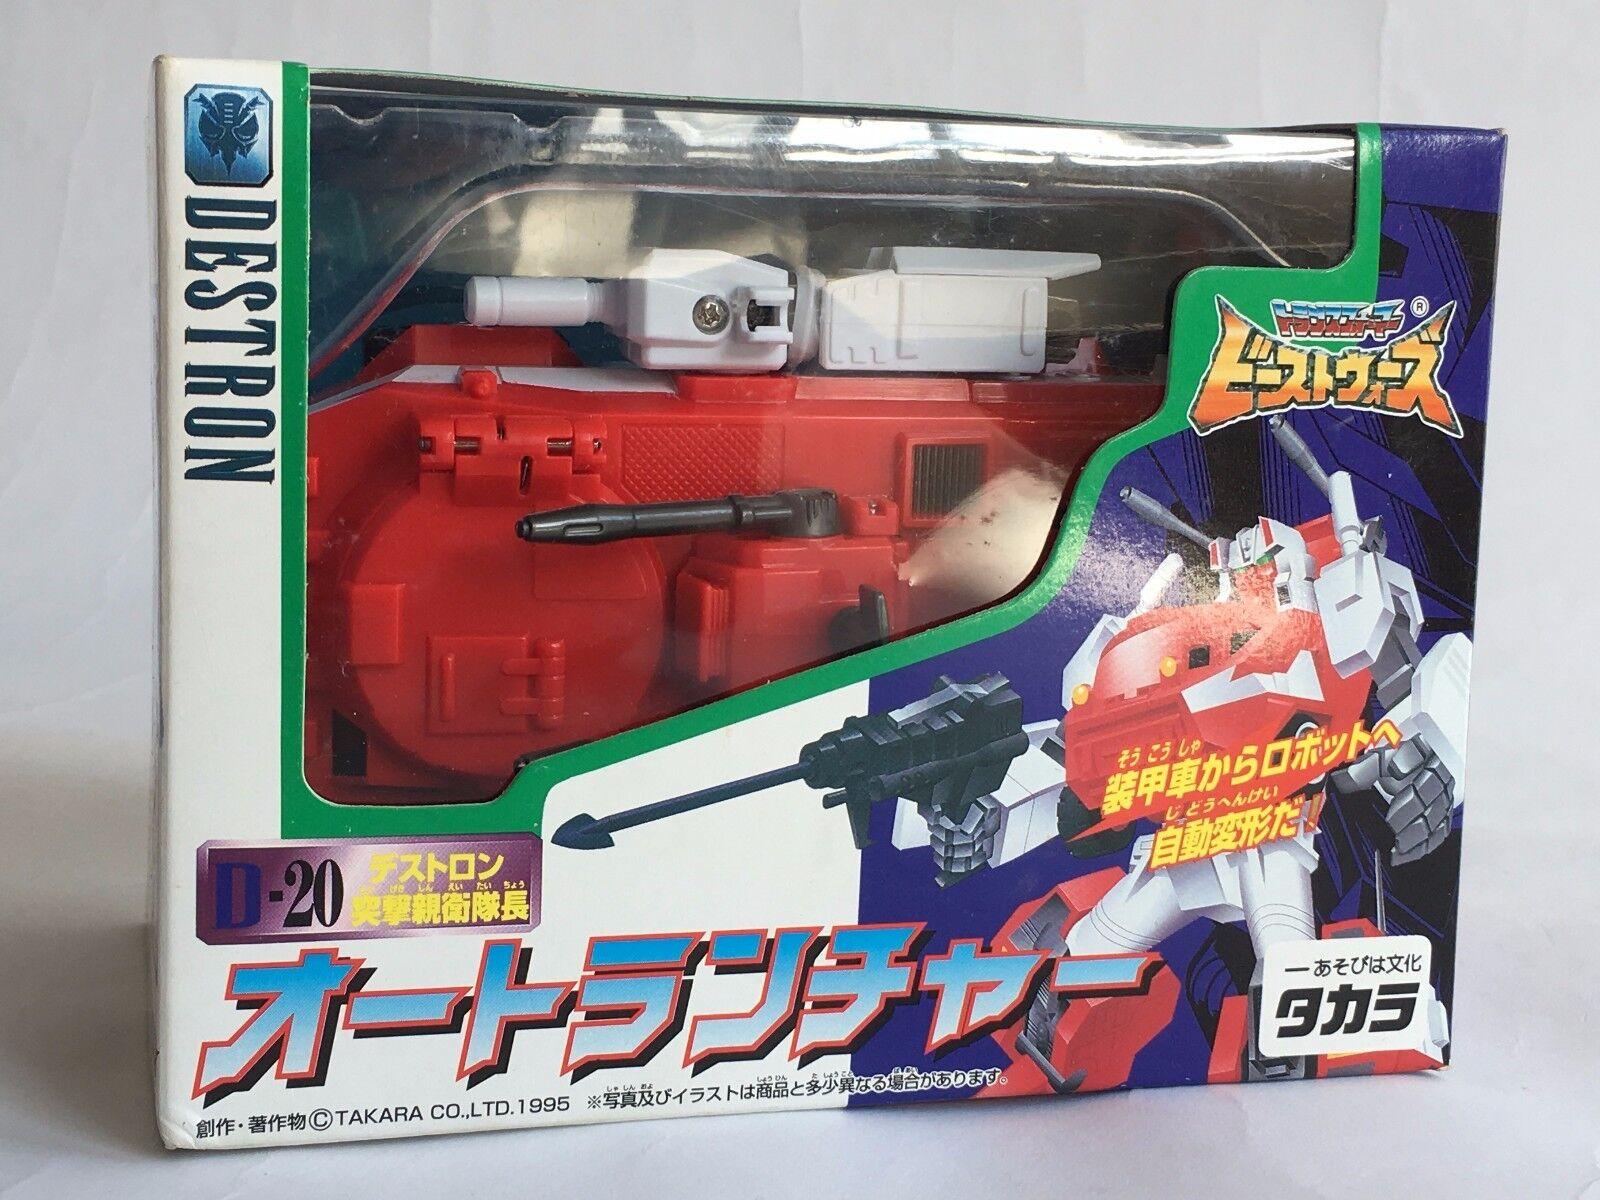 Japan Rare TAKARA Beast Wars Second D-20 Auto Launcher Action Figure MISB